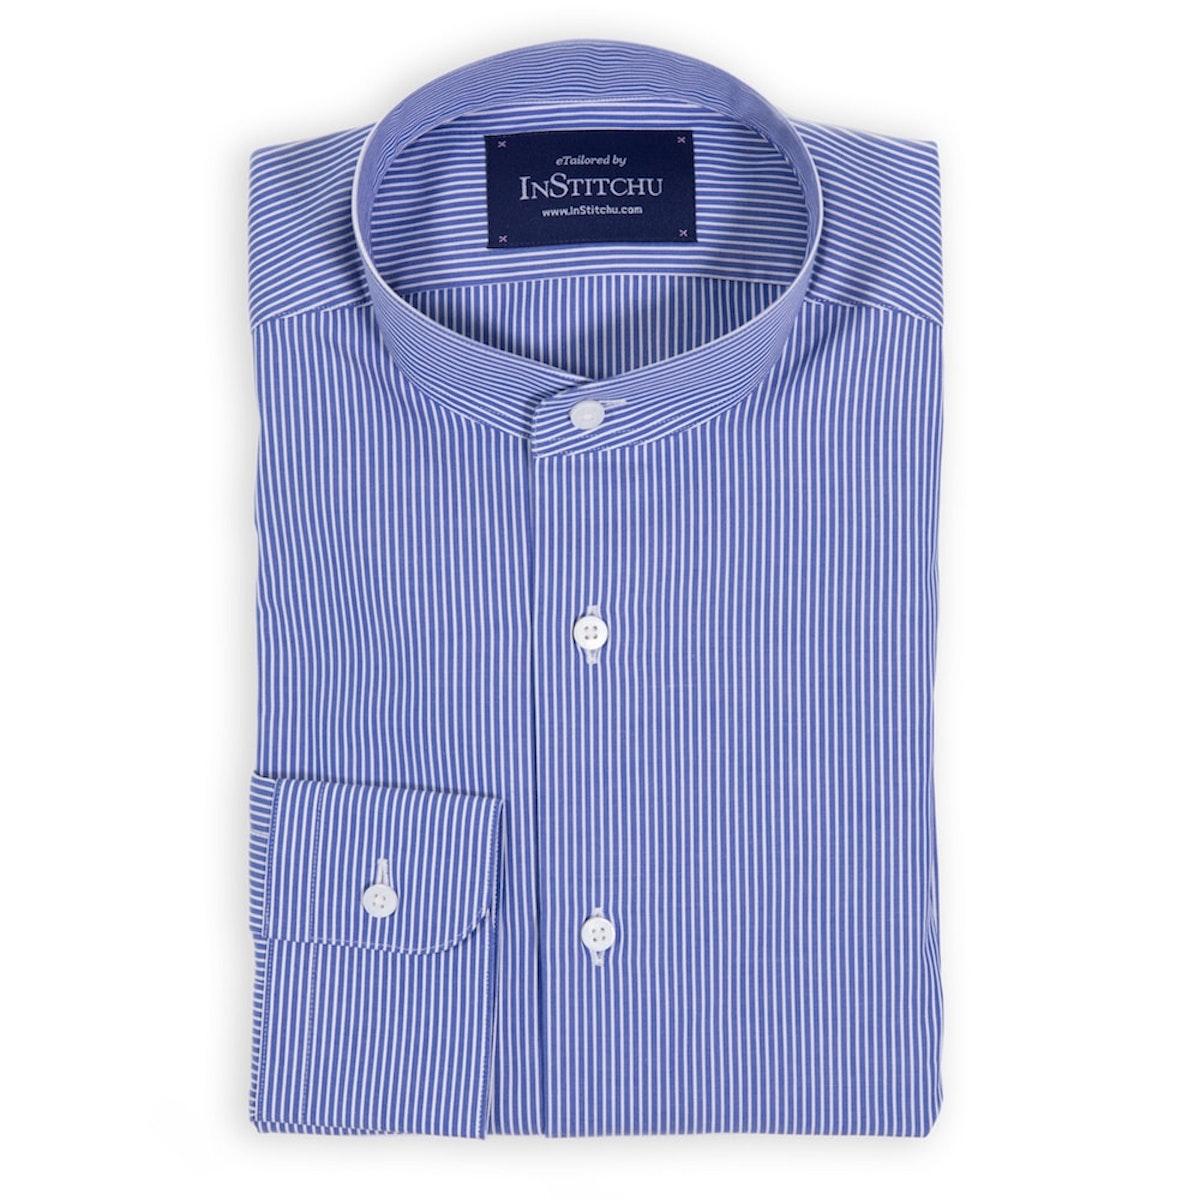 Medium Blue Fine Striped Band Collar Shirt